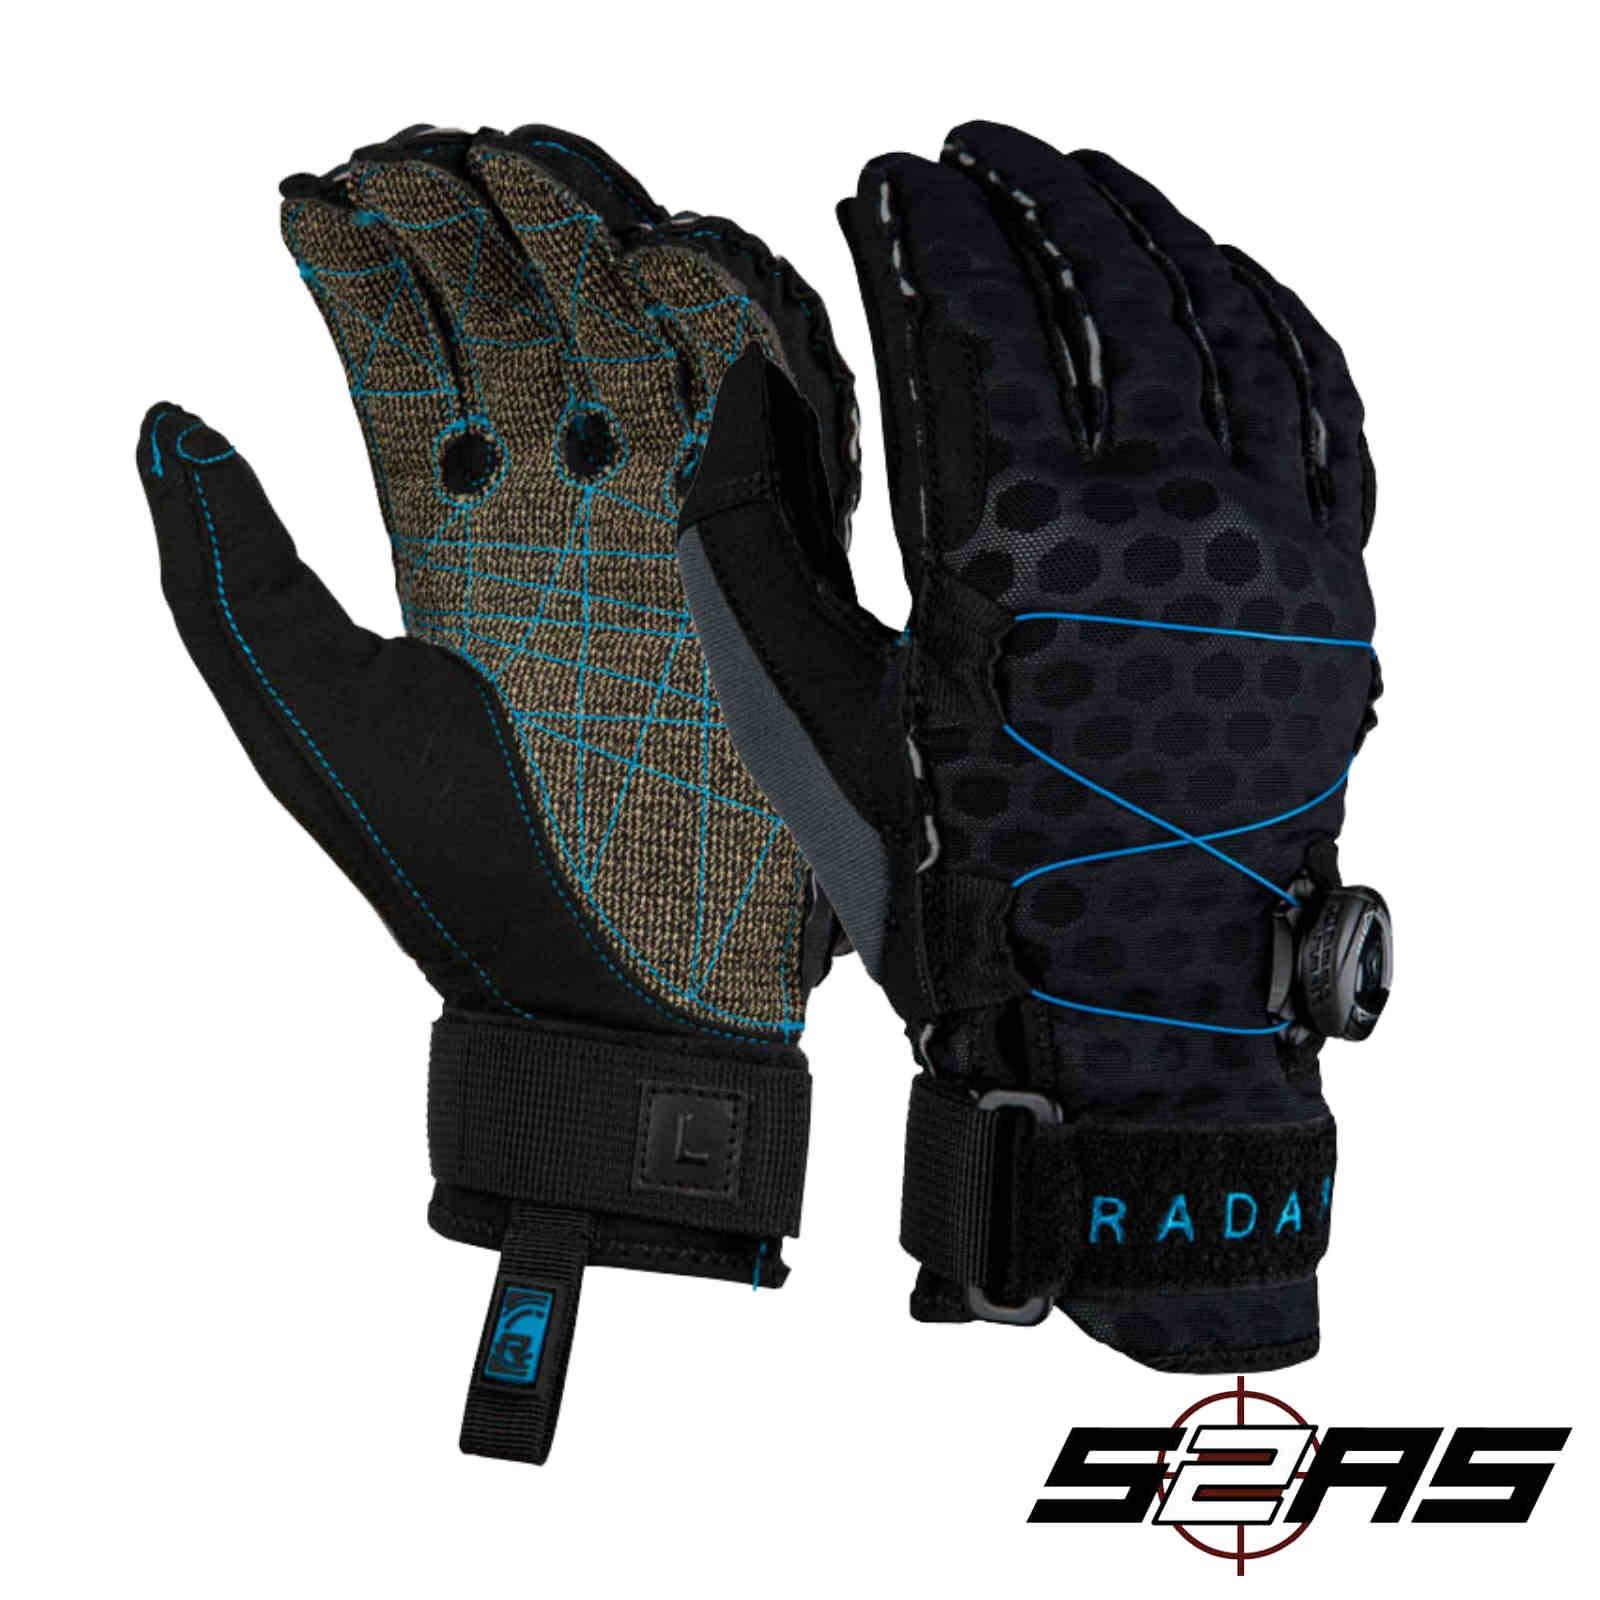 Radar Vapor K - BOA - Inside-Out Glove - Black/Blue Ariaprene - XL